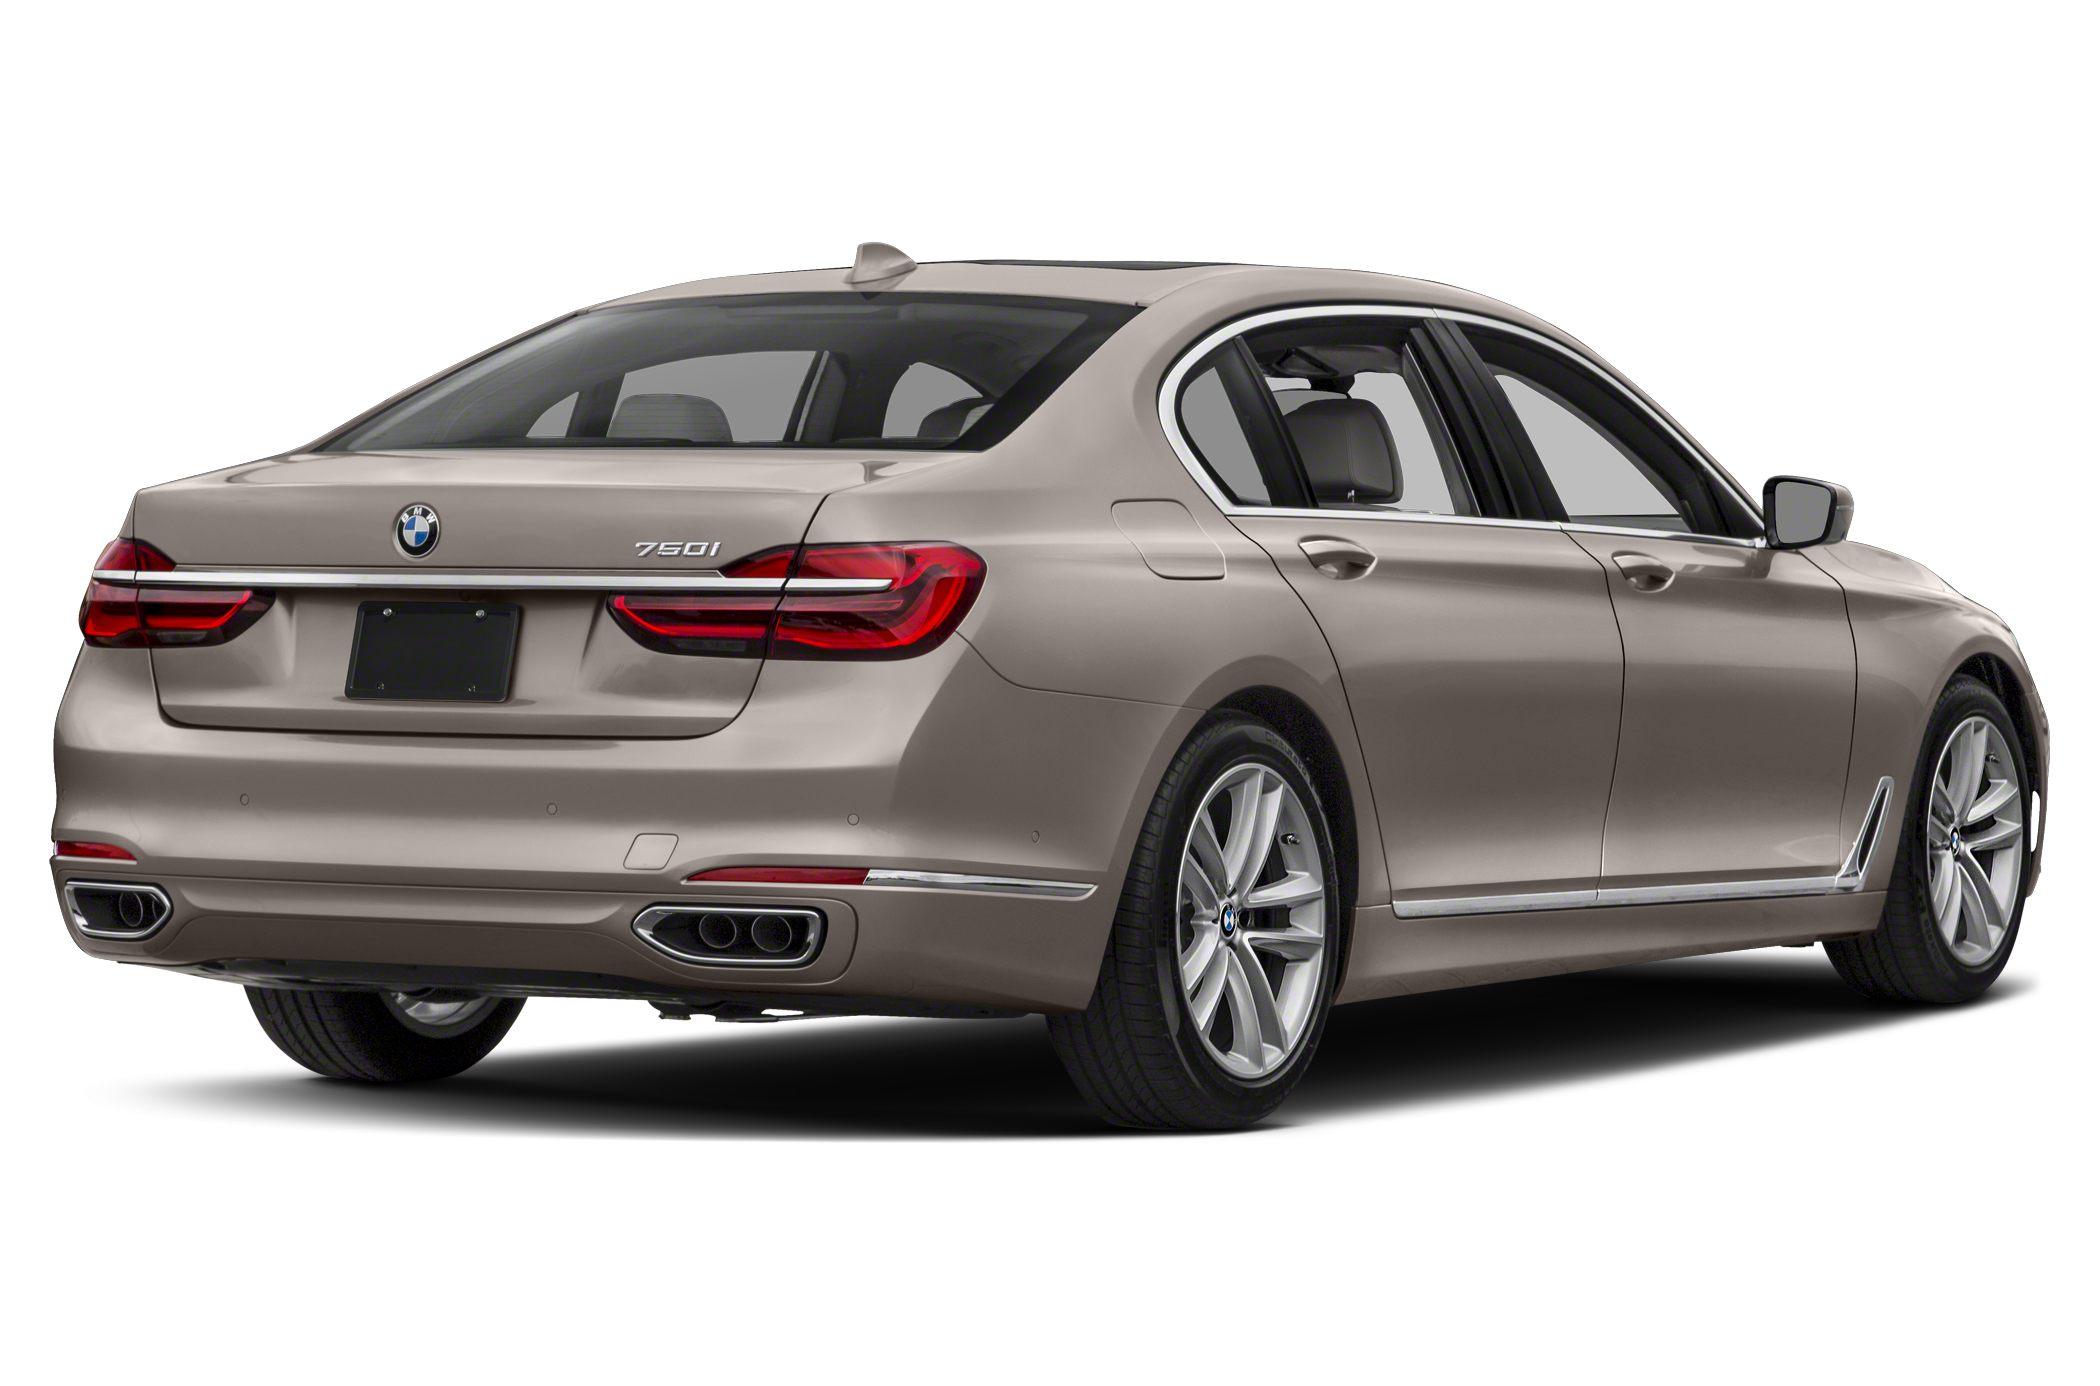 מודרניסטית 2017 BMW 750 Specs and Prices QN-24